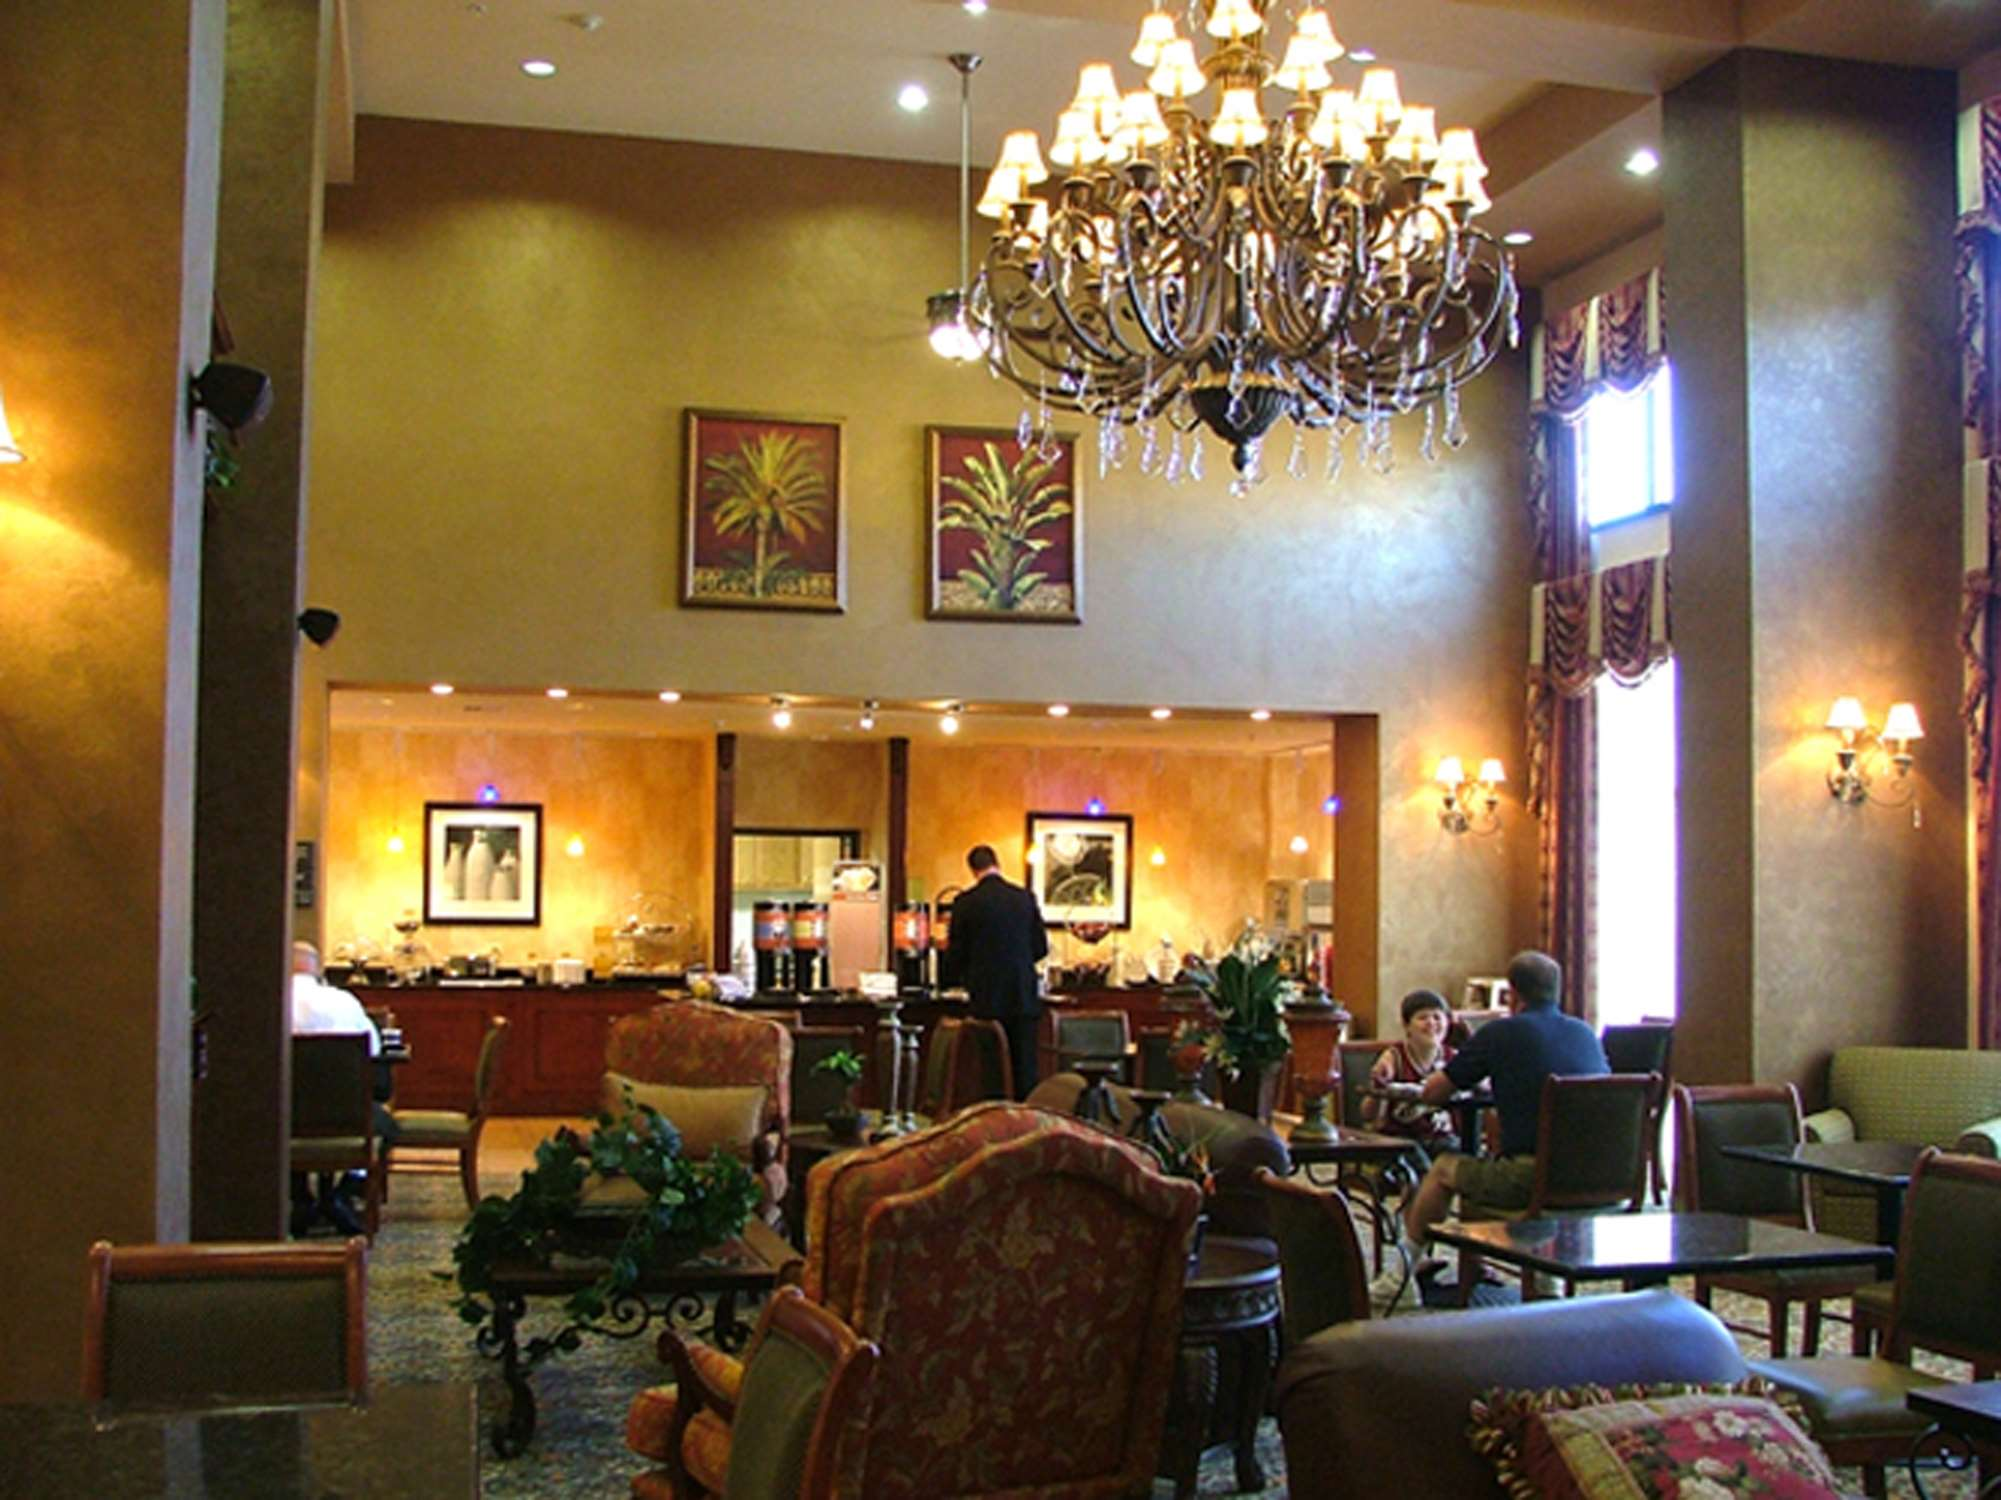 Hampton Inn & Suites Bolingbrook image 12